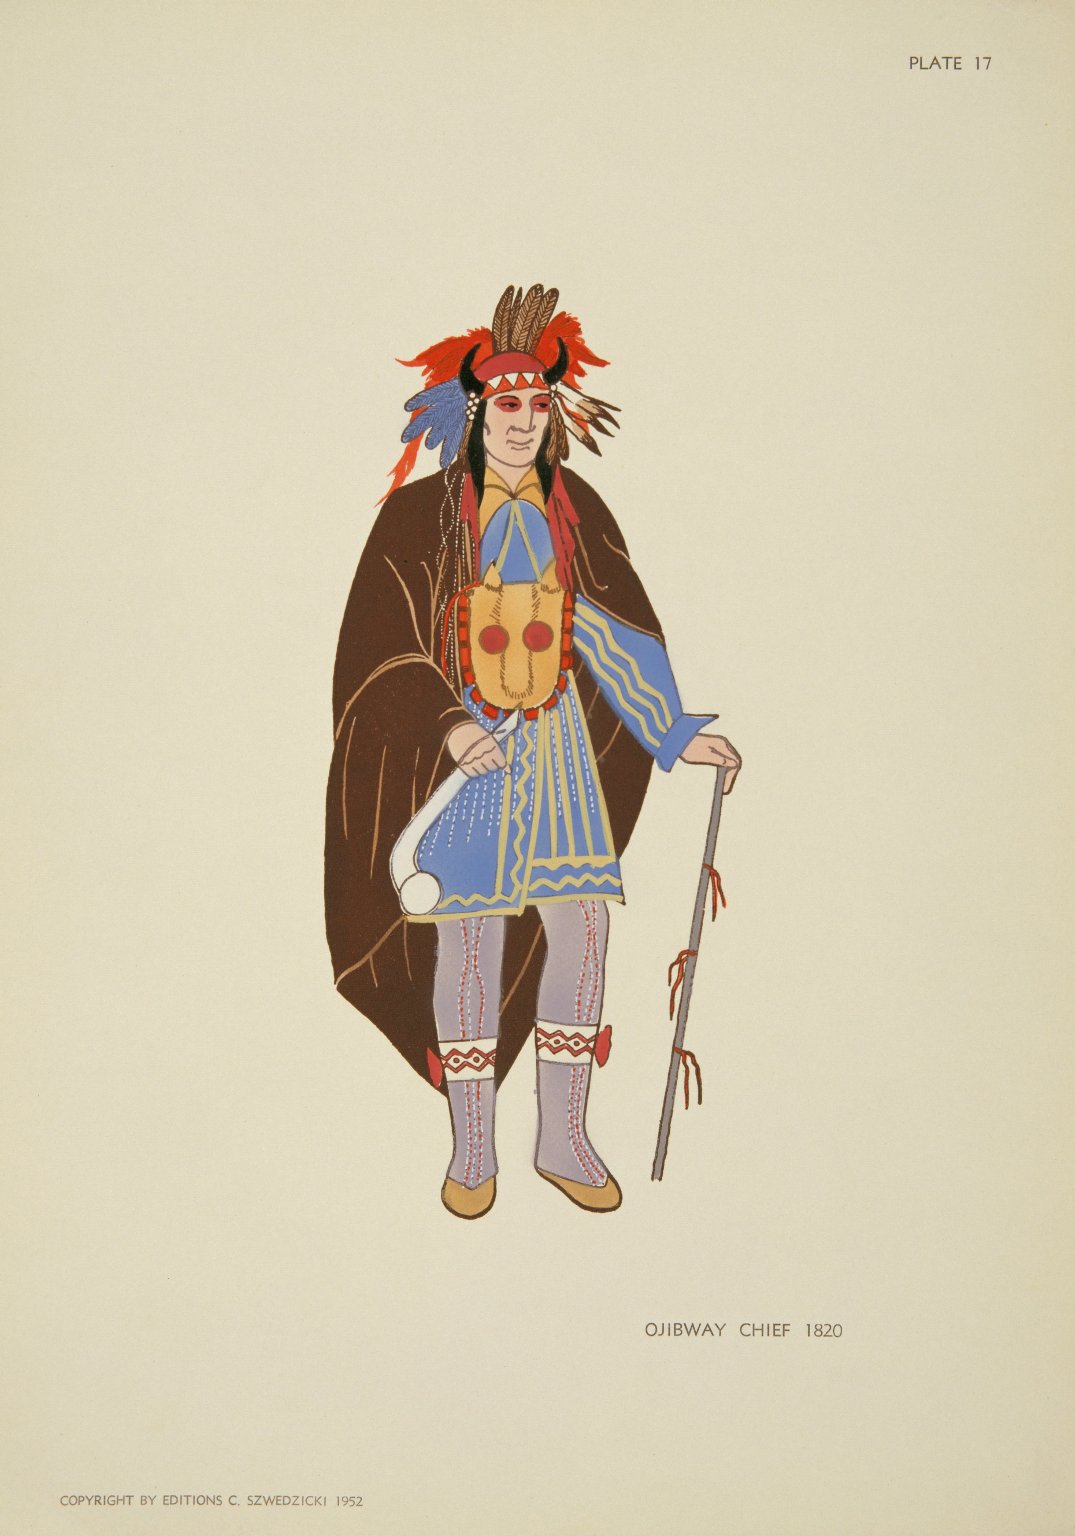 OJIBWAY CHIEF 1820